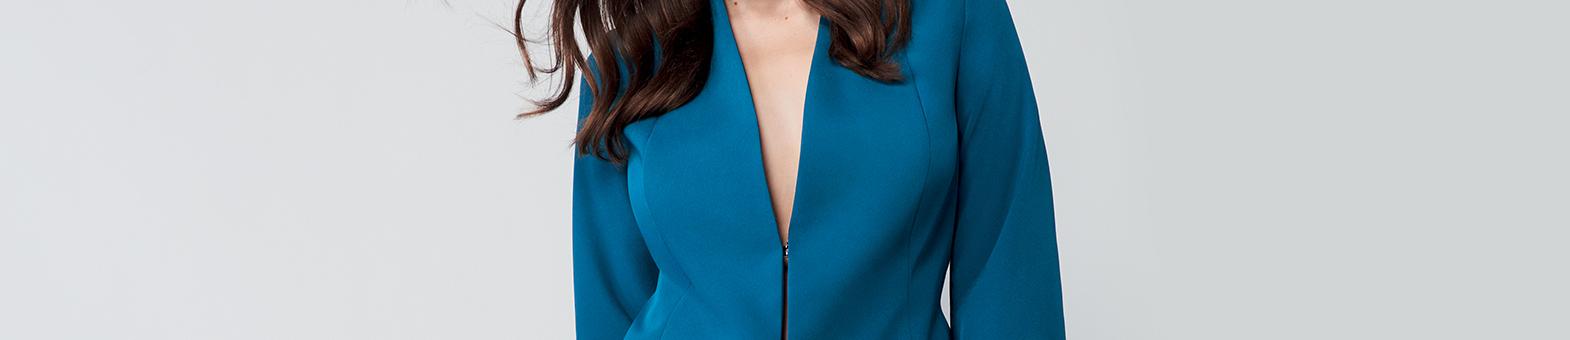 Fiorella Rubino jackets